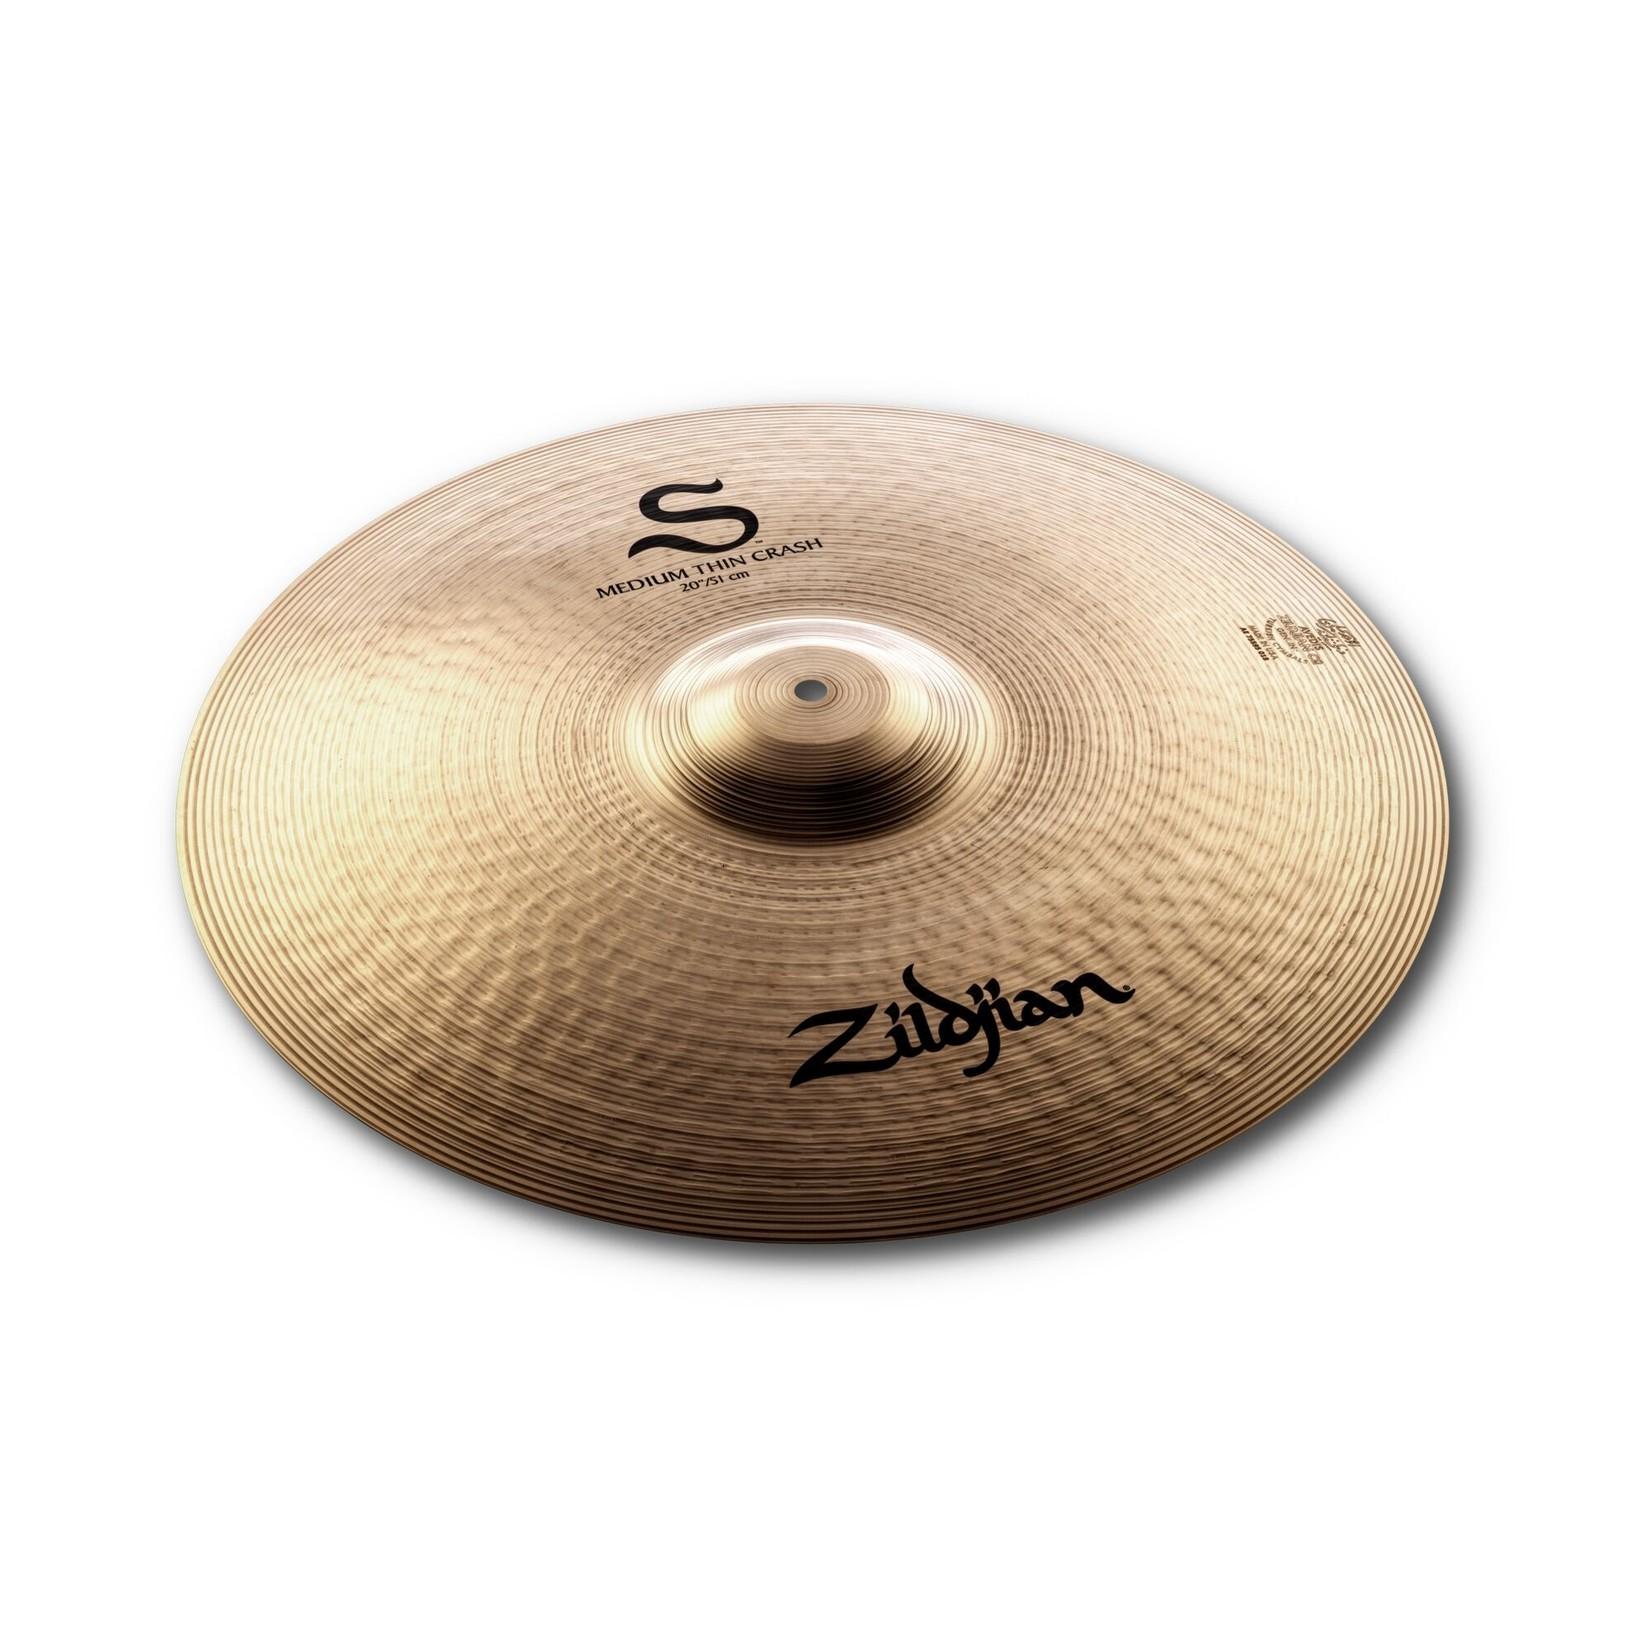 "Zildjian Zildjian 20"" S Medium Thin Crash"